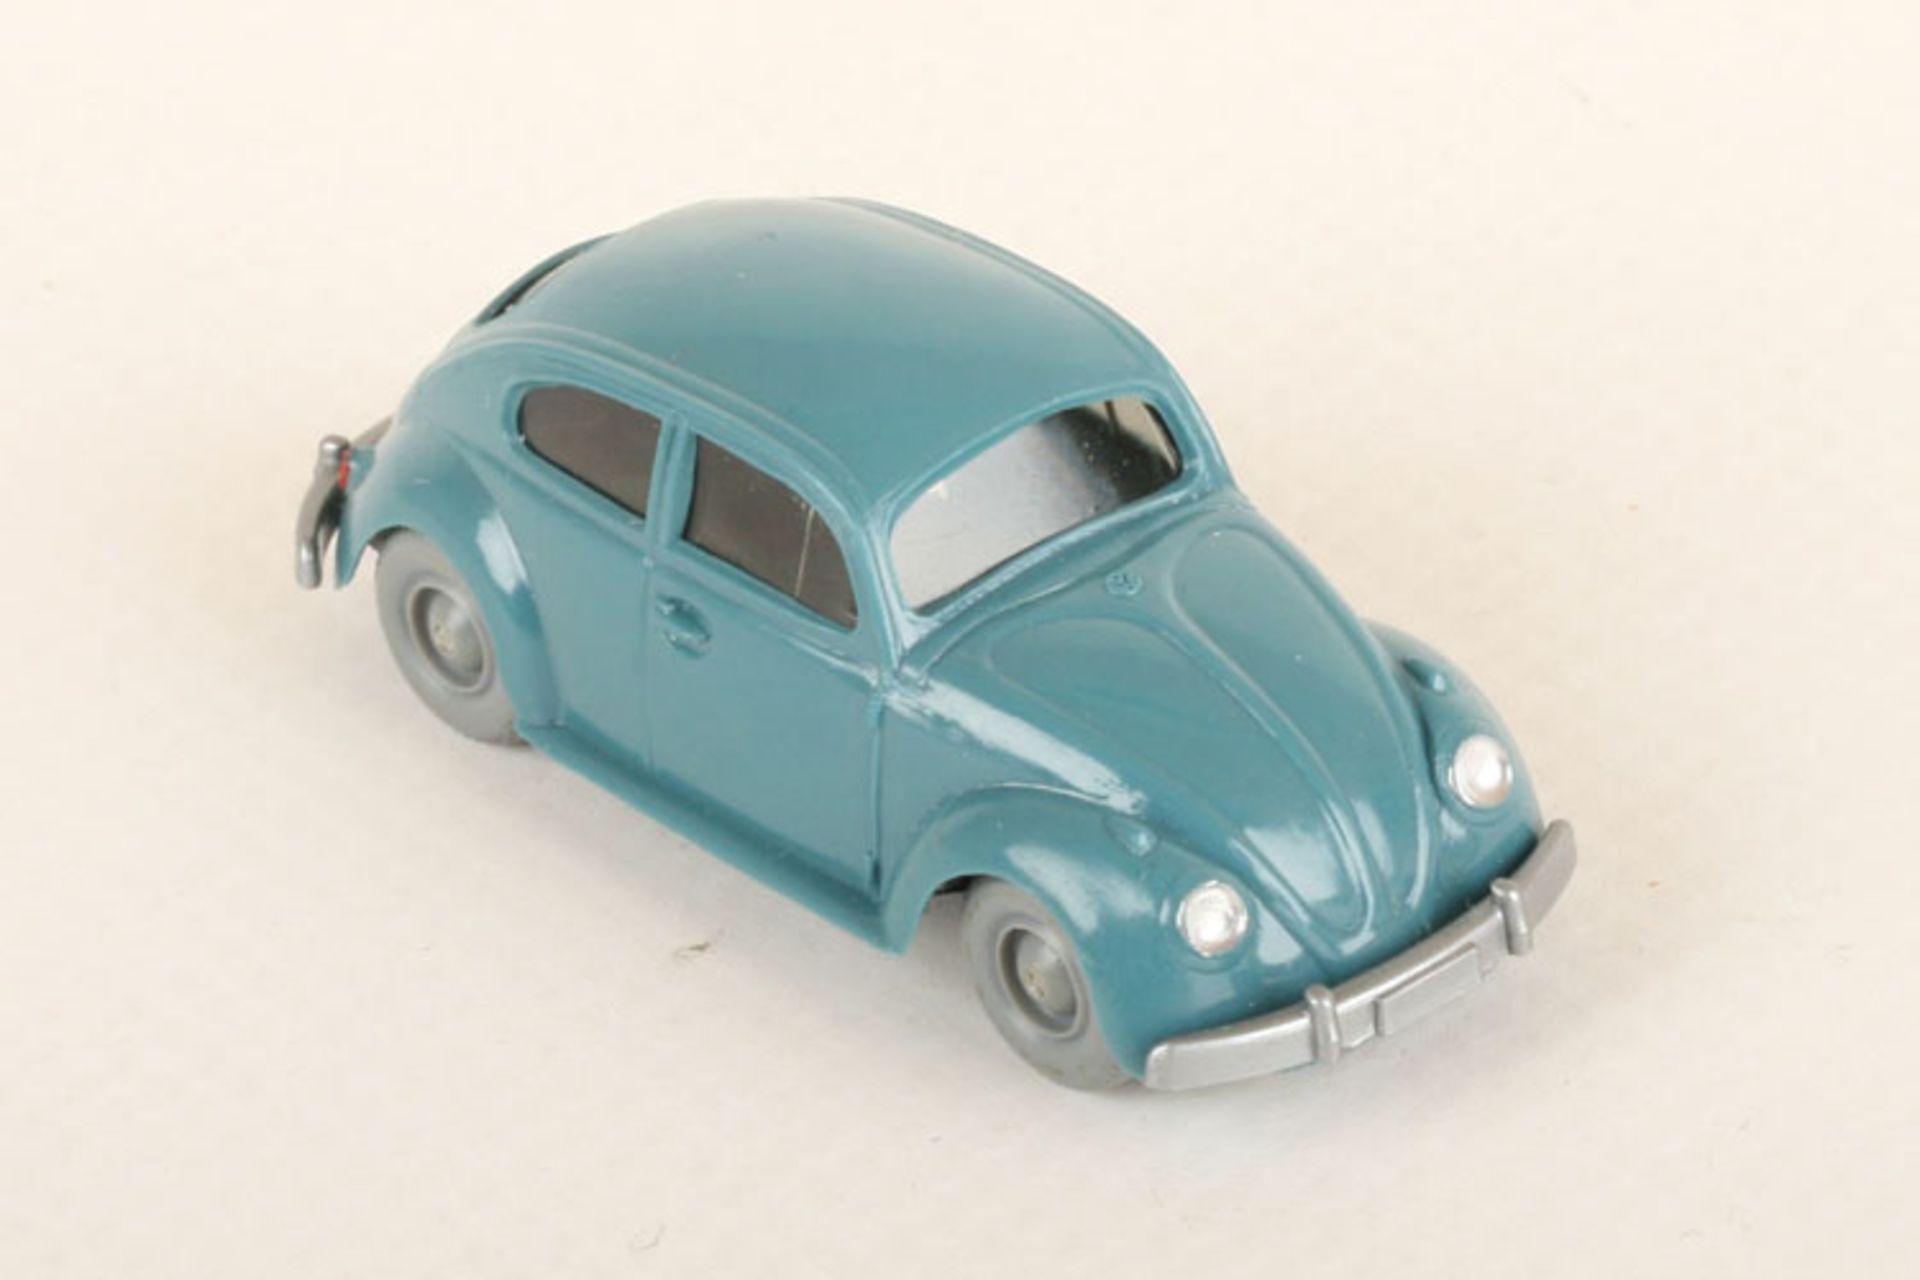 Los 1003 - Wiking VW Käfer Export diamantblau 30/8j, neuwertig